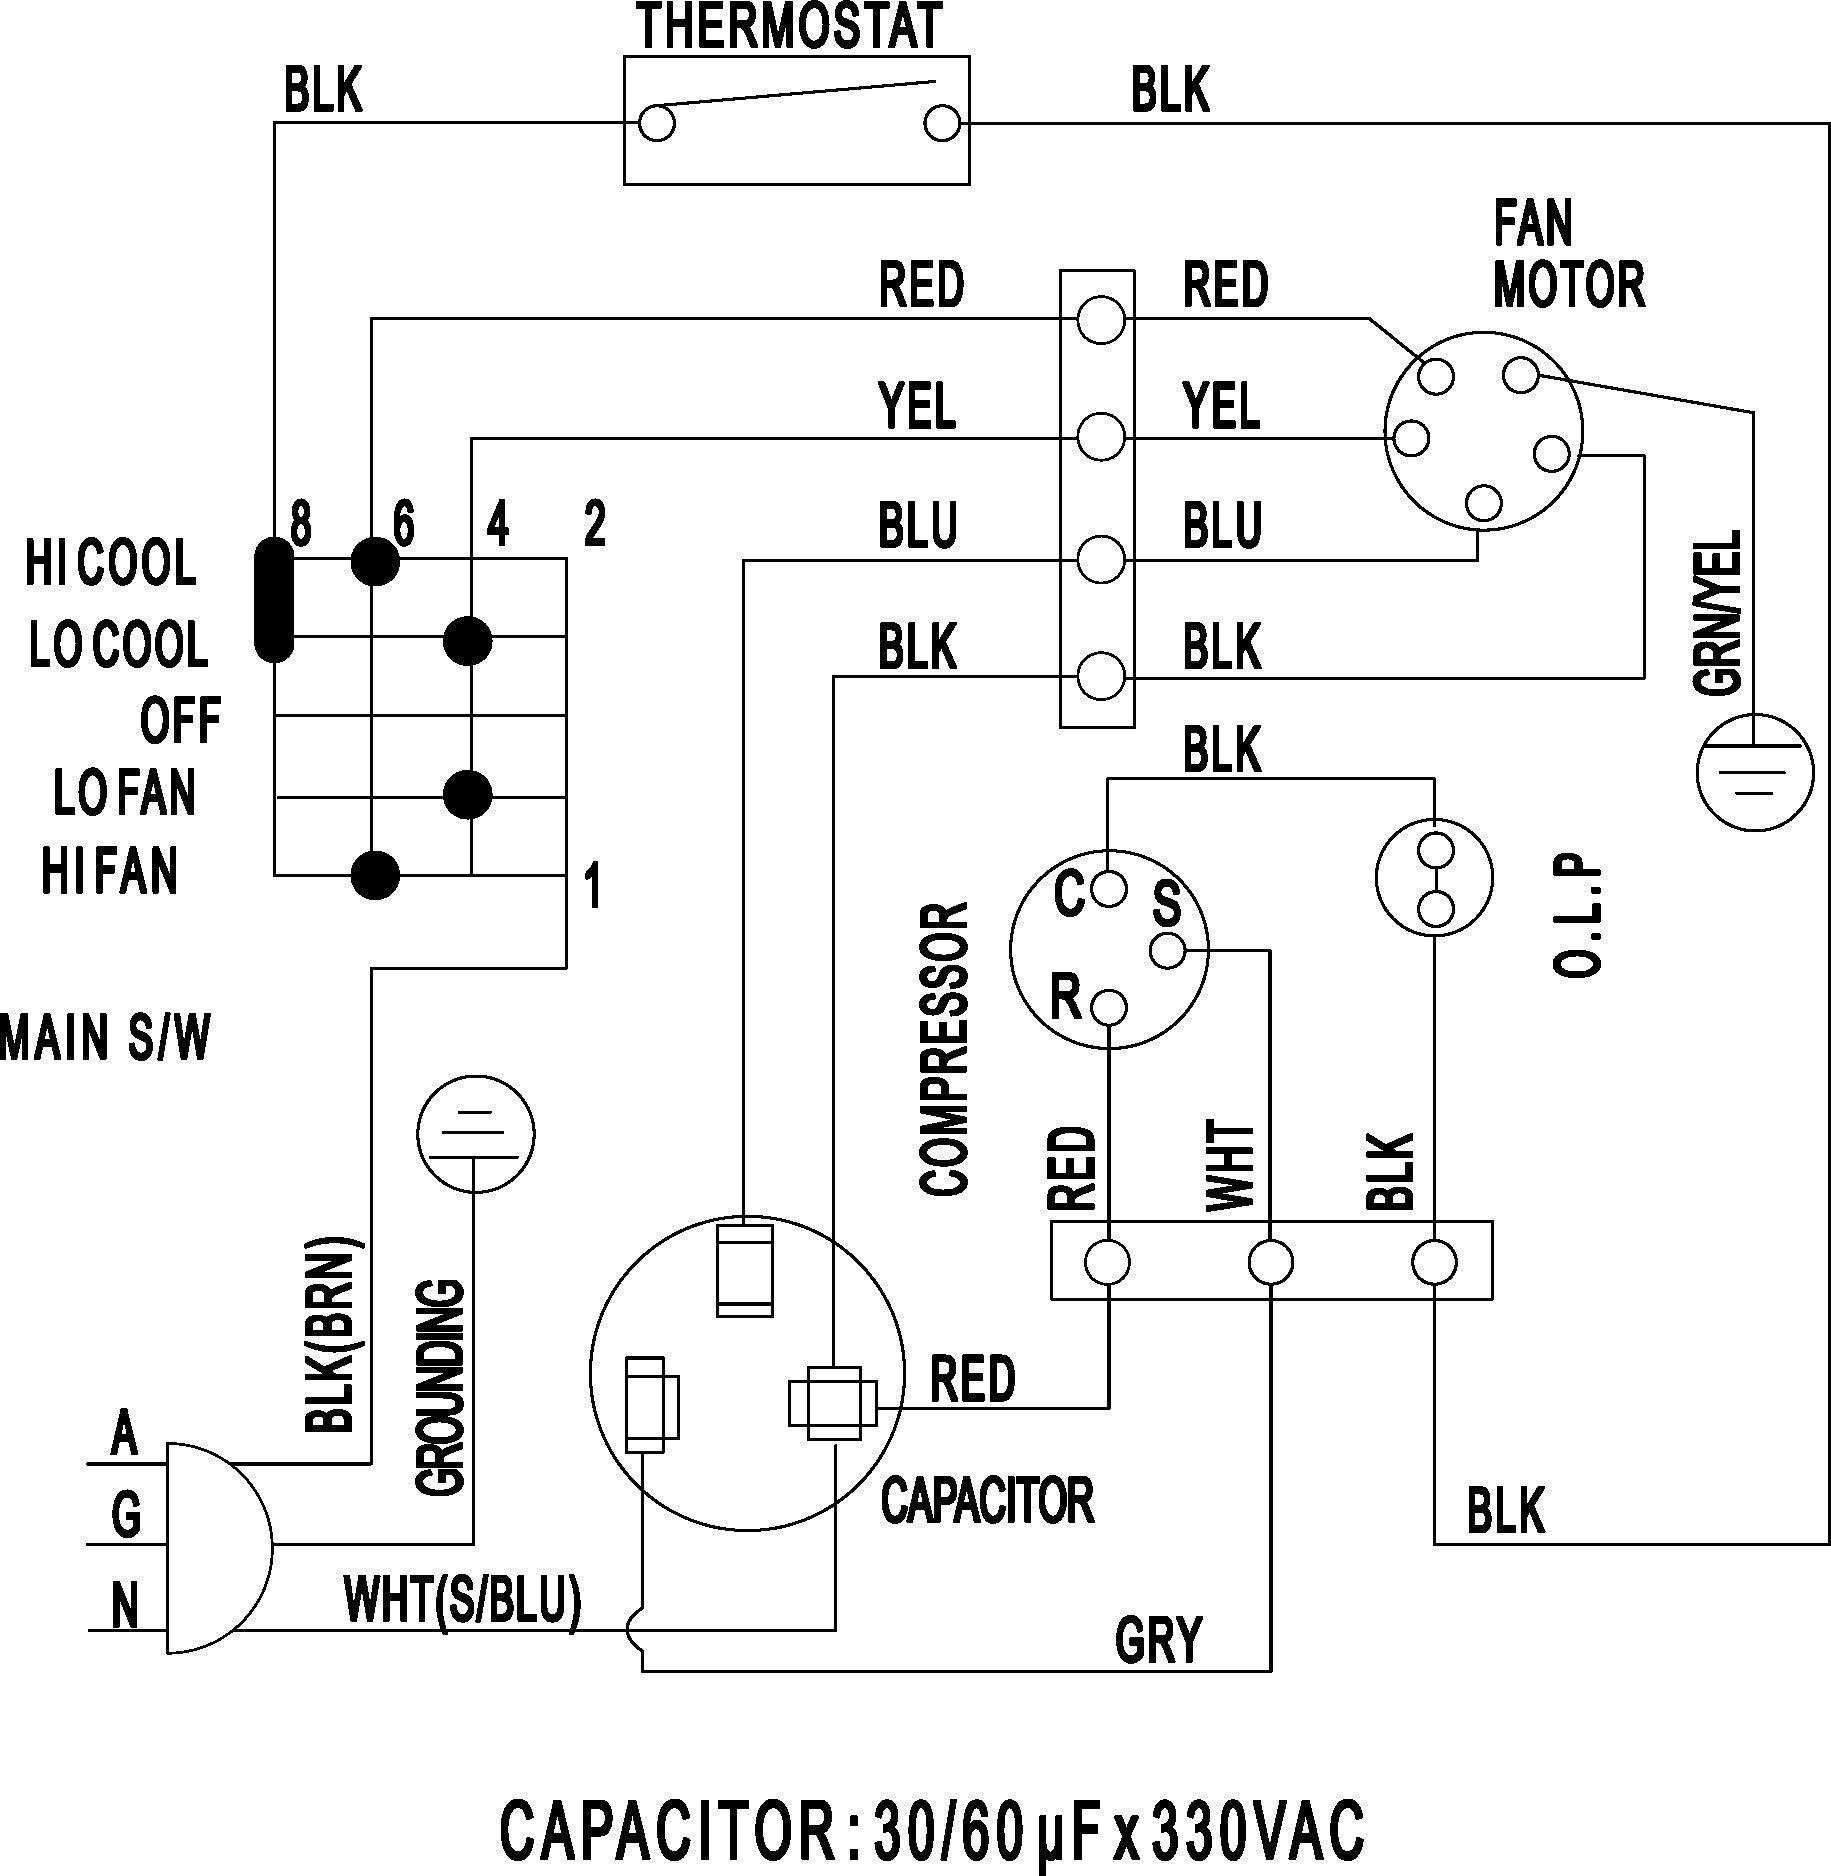 Ac Plug Wiring Diagram from i.pinimg.com